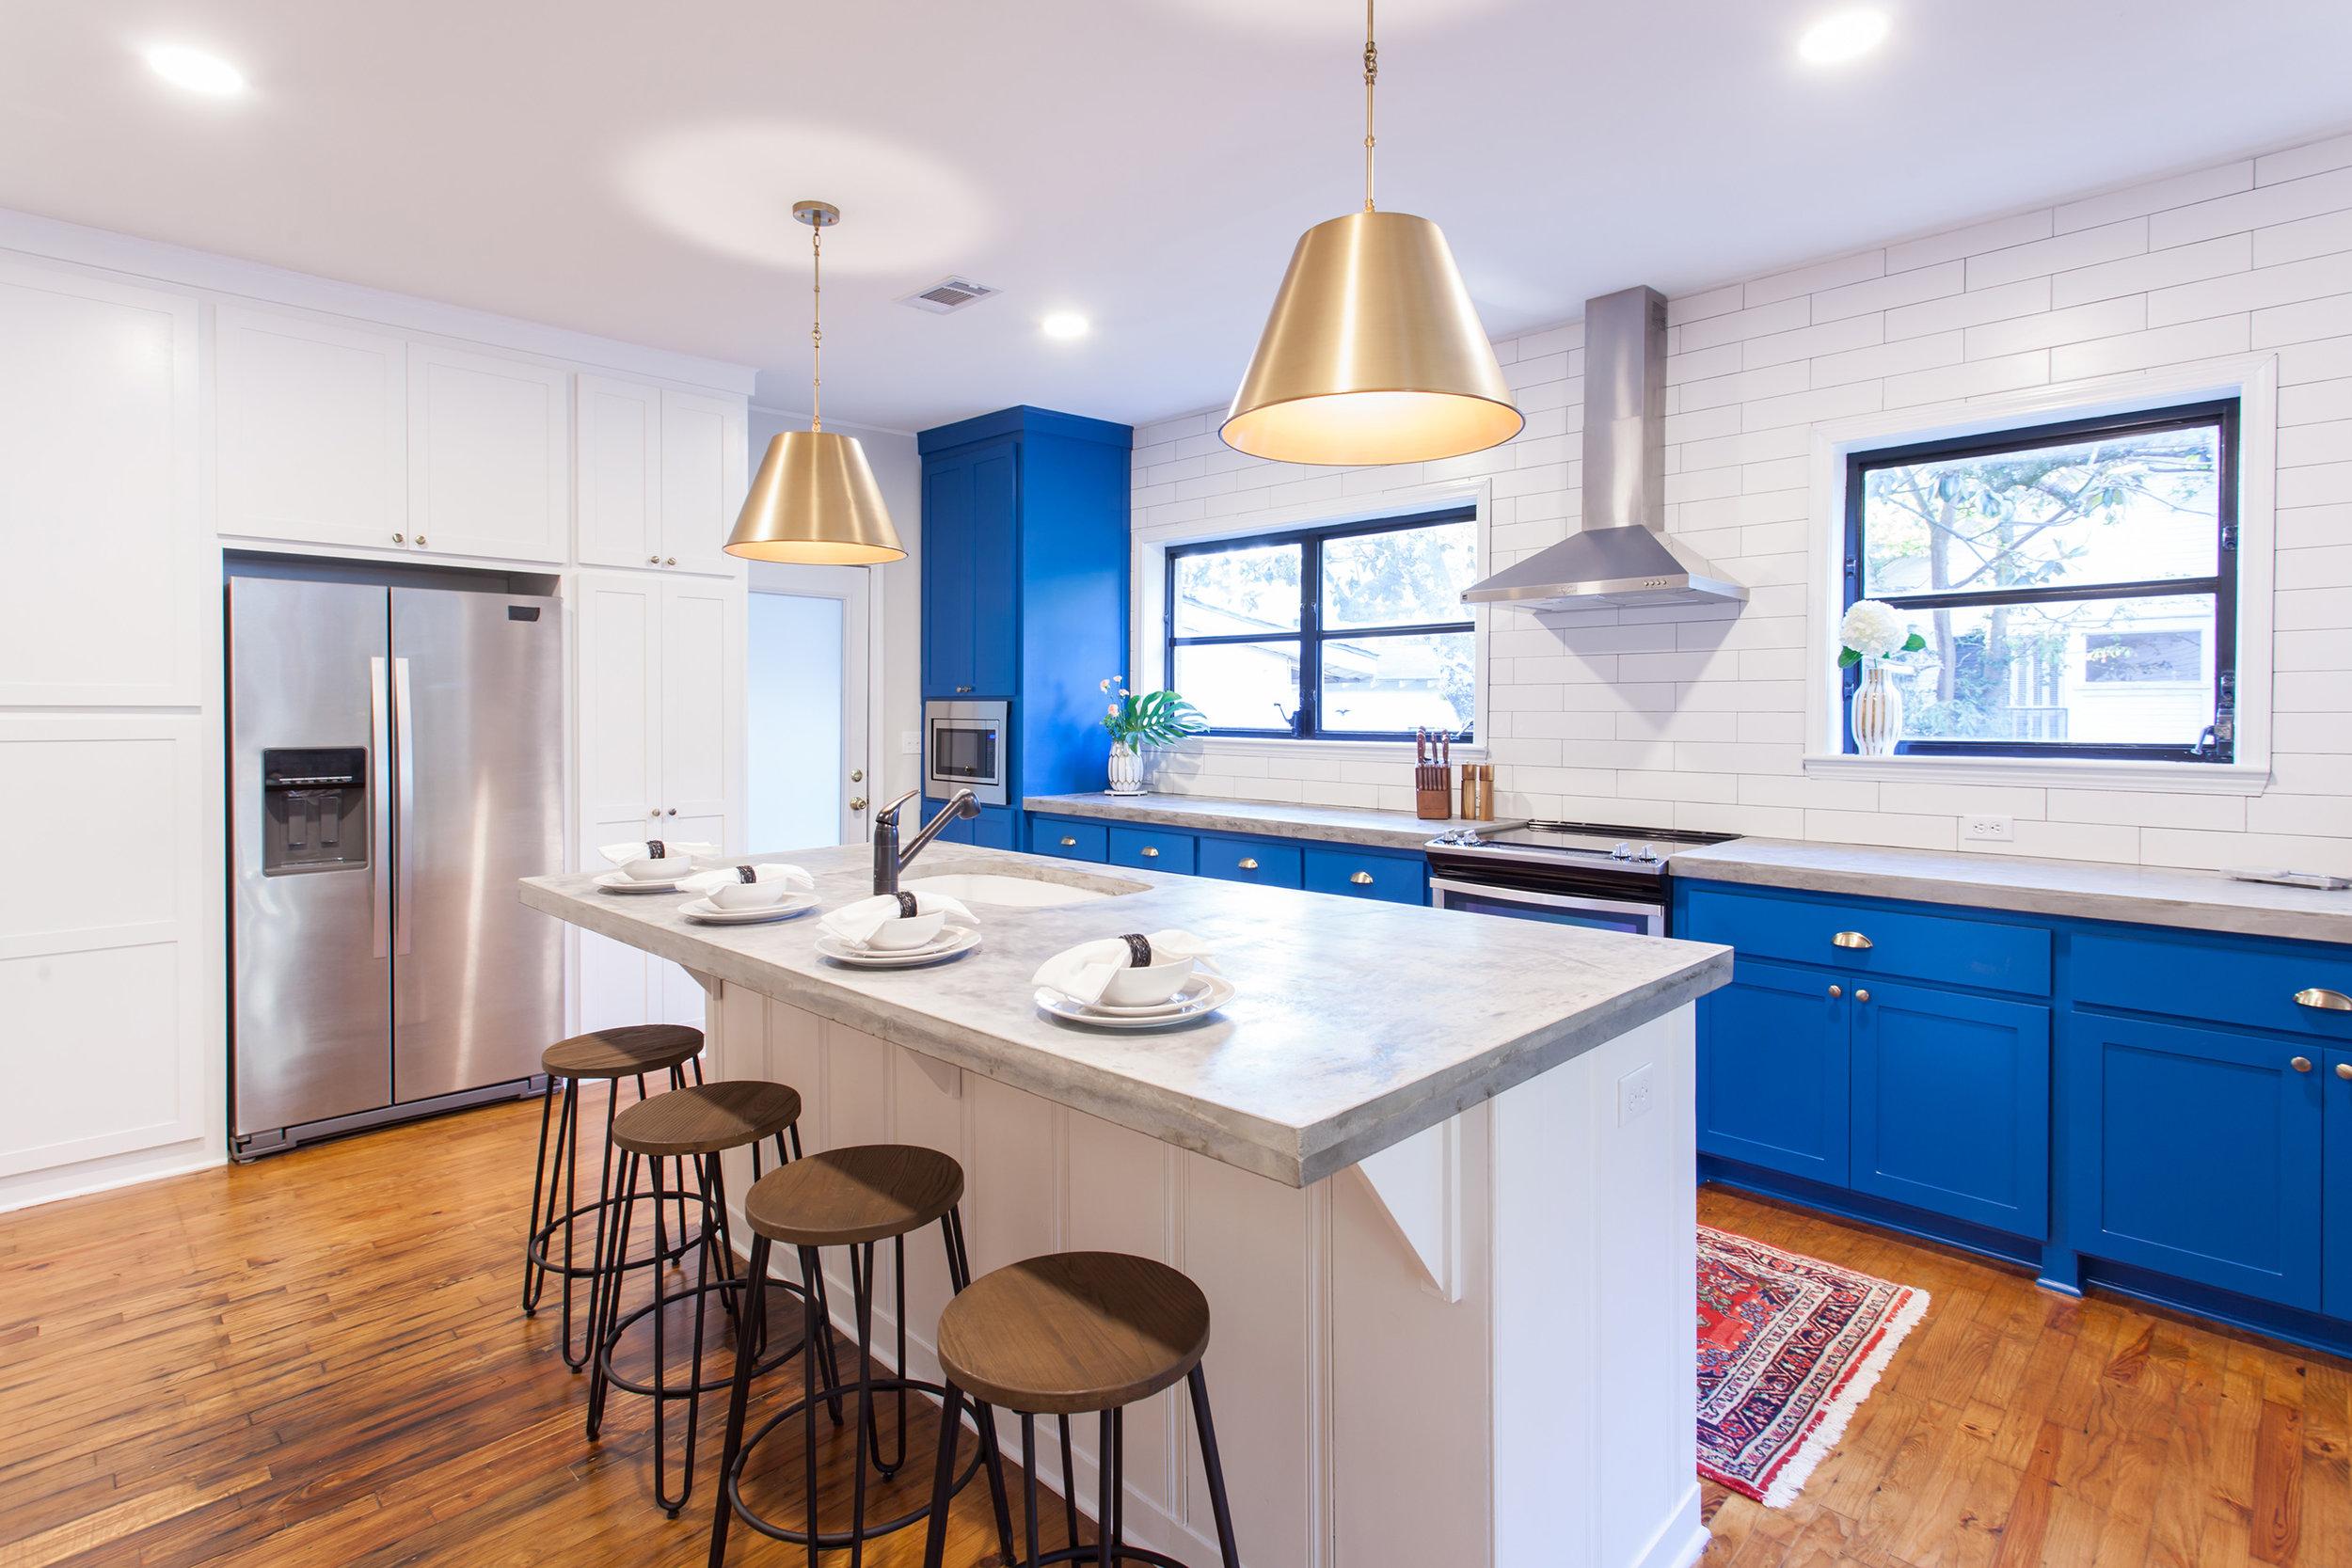 Renovated Kitchen - Modern Design